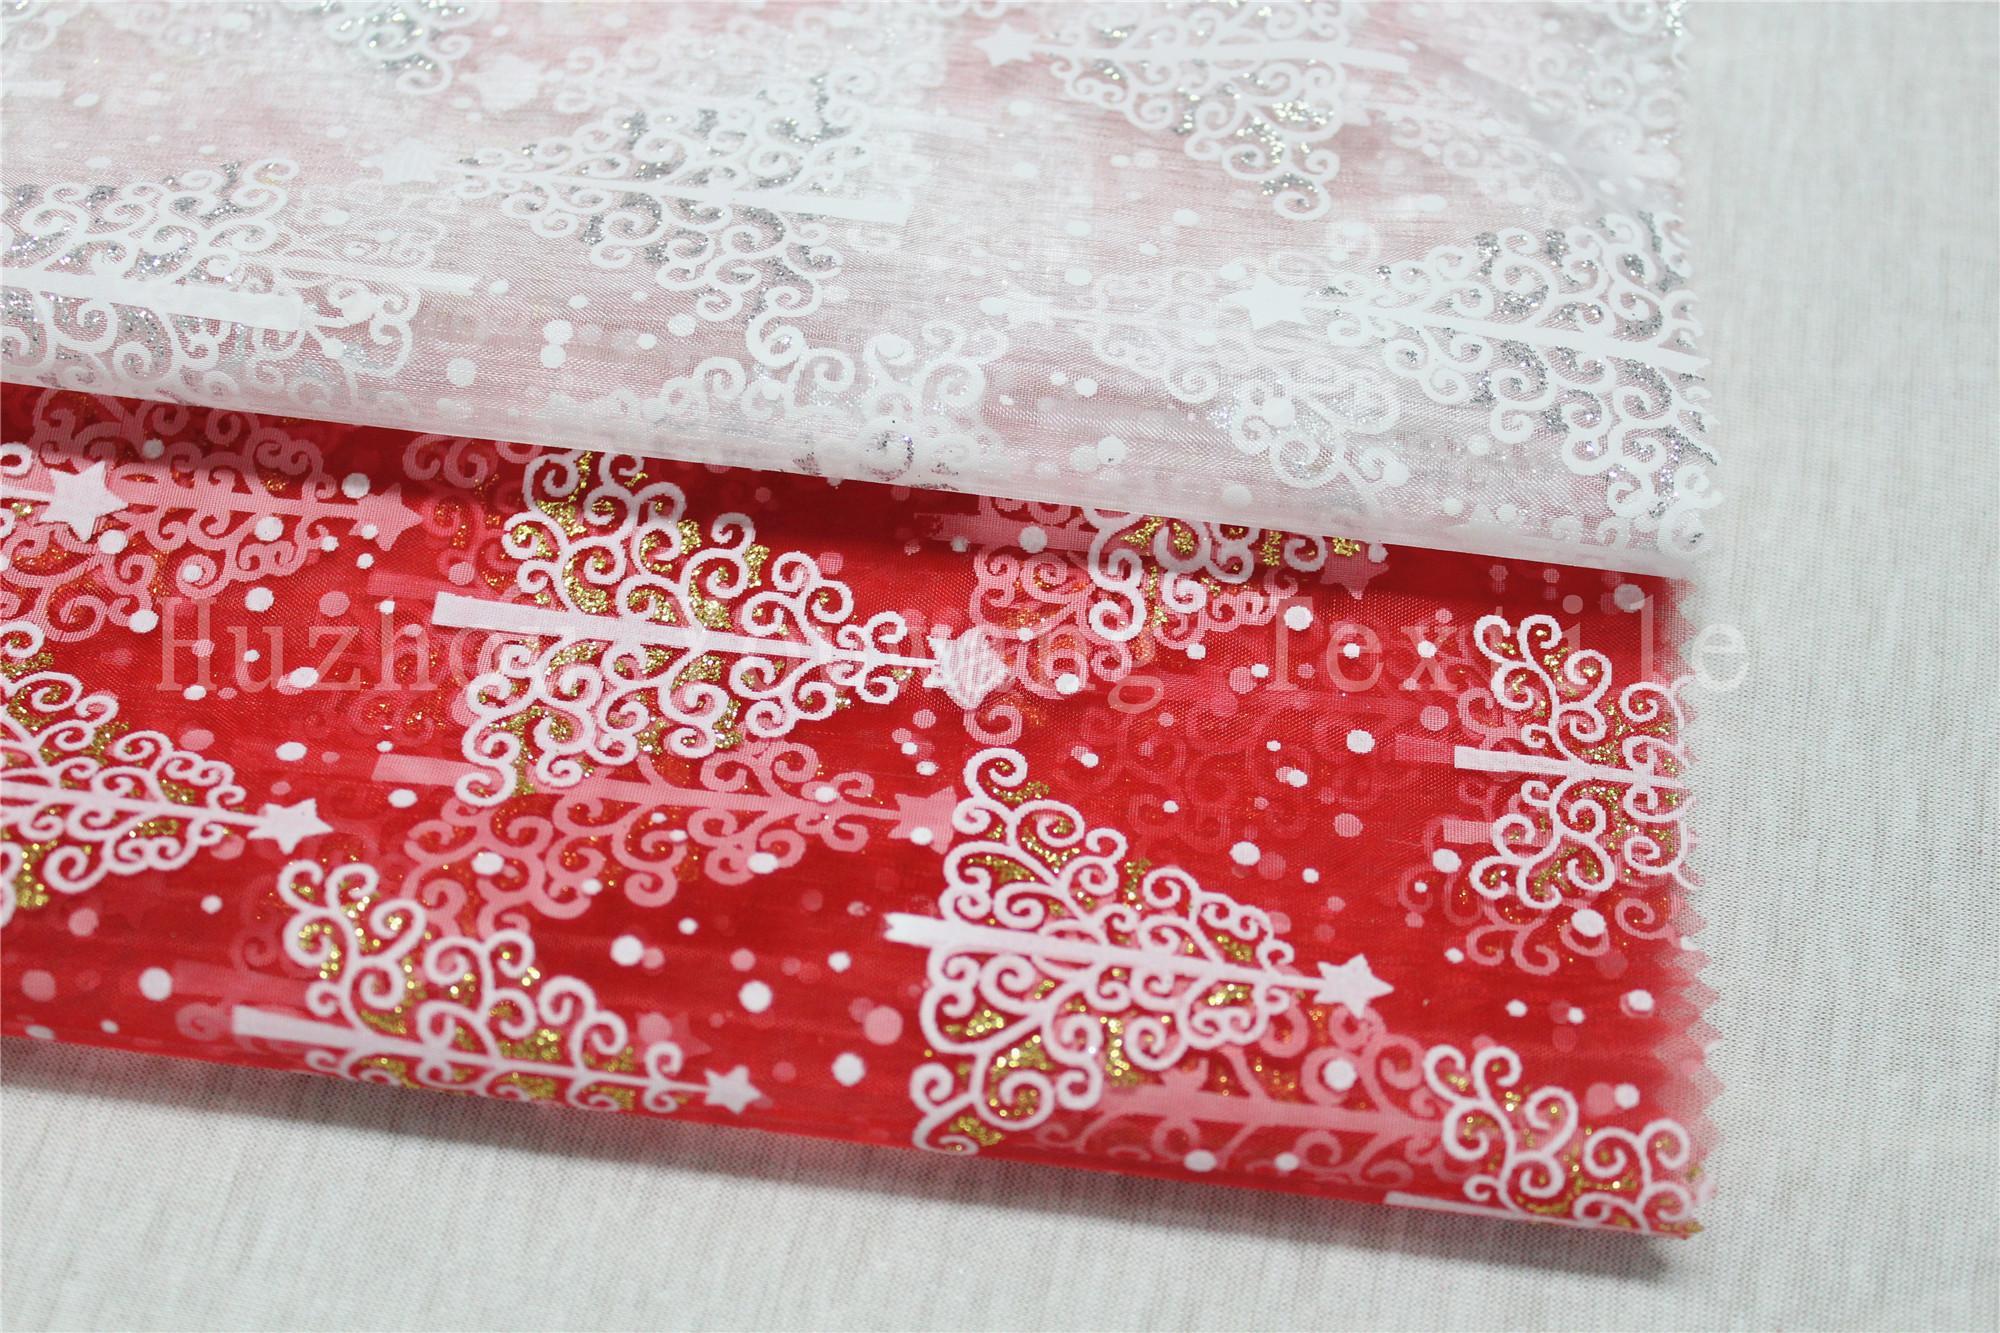 Glitter Christmas Design Glass Organza Fabric